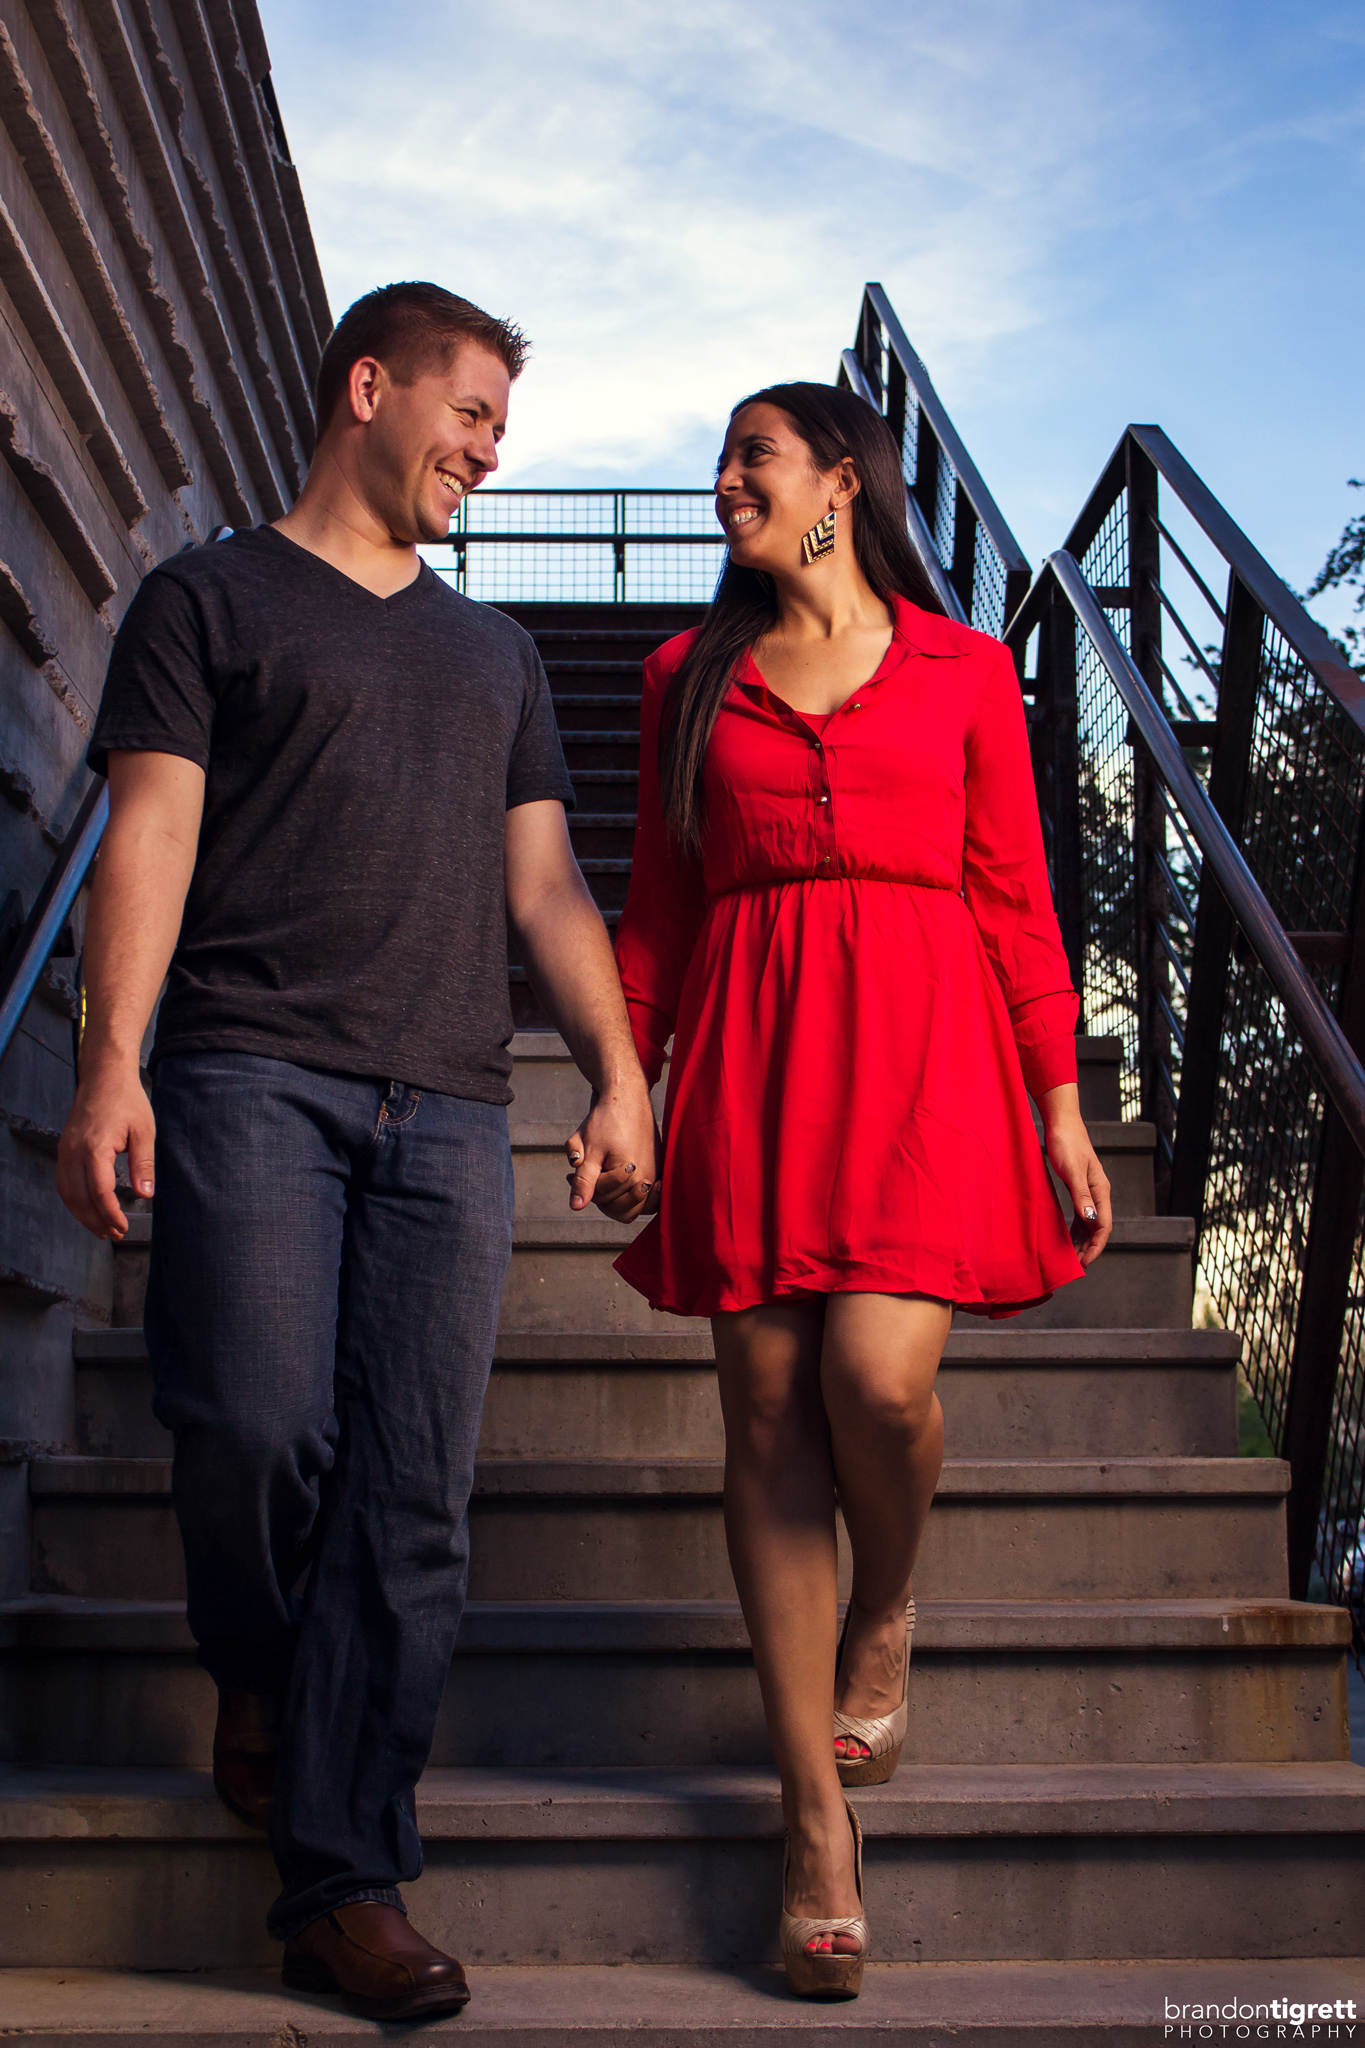 2014_Brandon-Tigrett_Scottsdale_couple_Caraline-Jackson-129_WEB.jpg